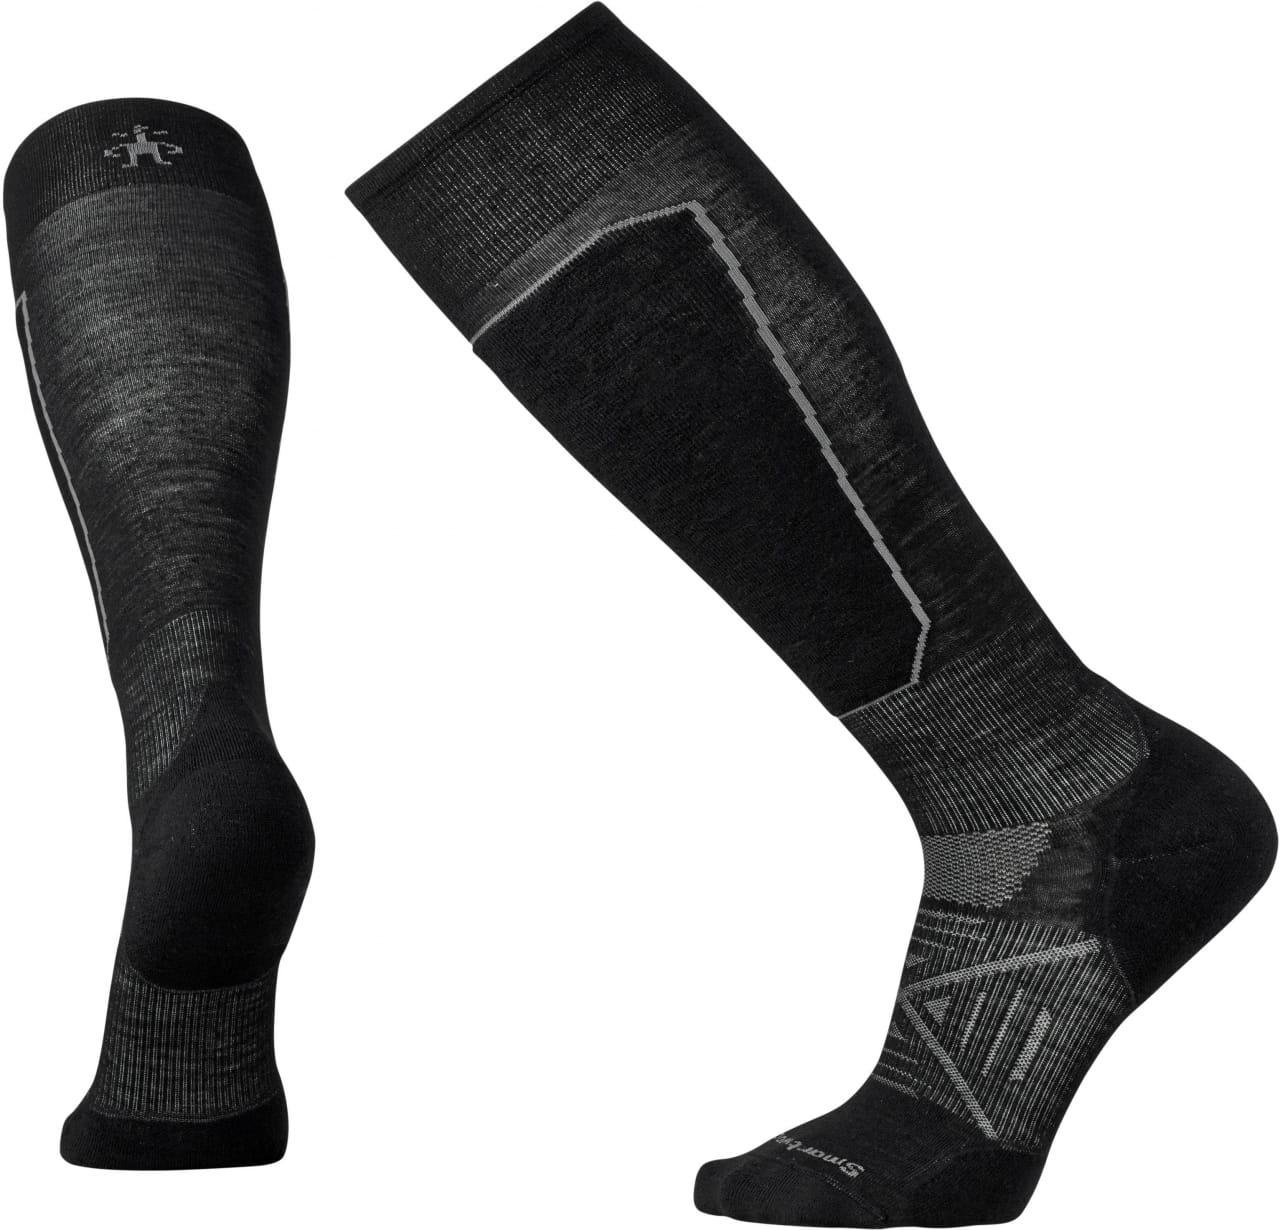 Unisexové ponožky Smartwool Performance Ski Touring Otc